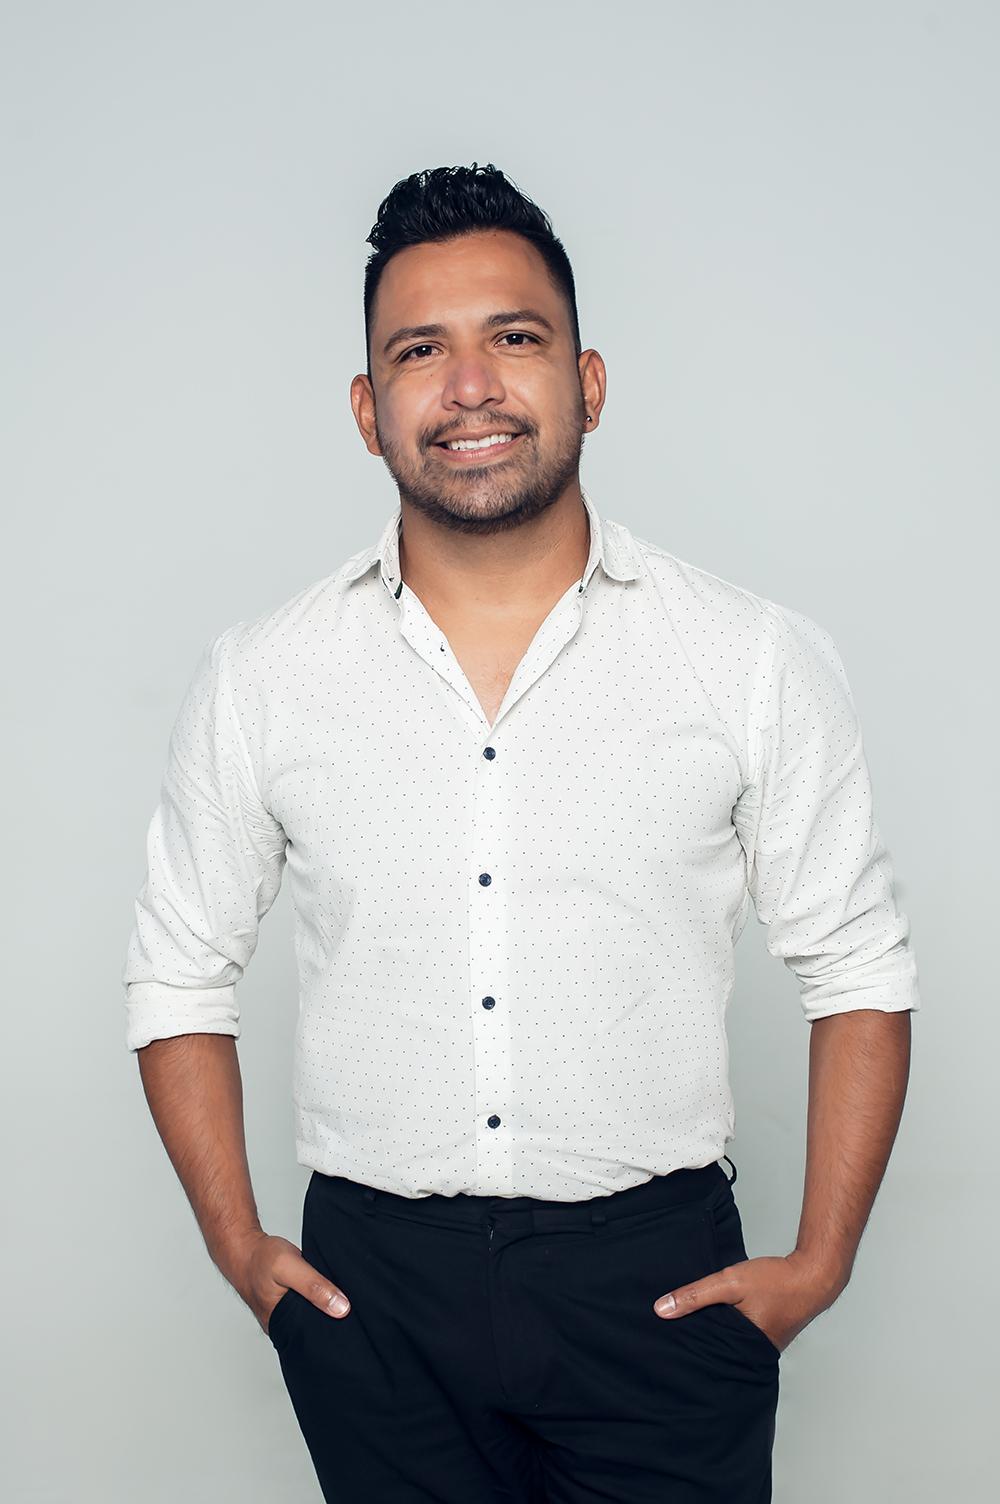 Luis Alberto Hernández